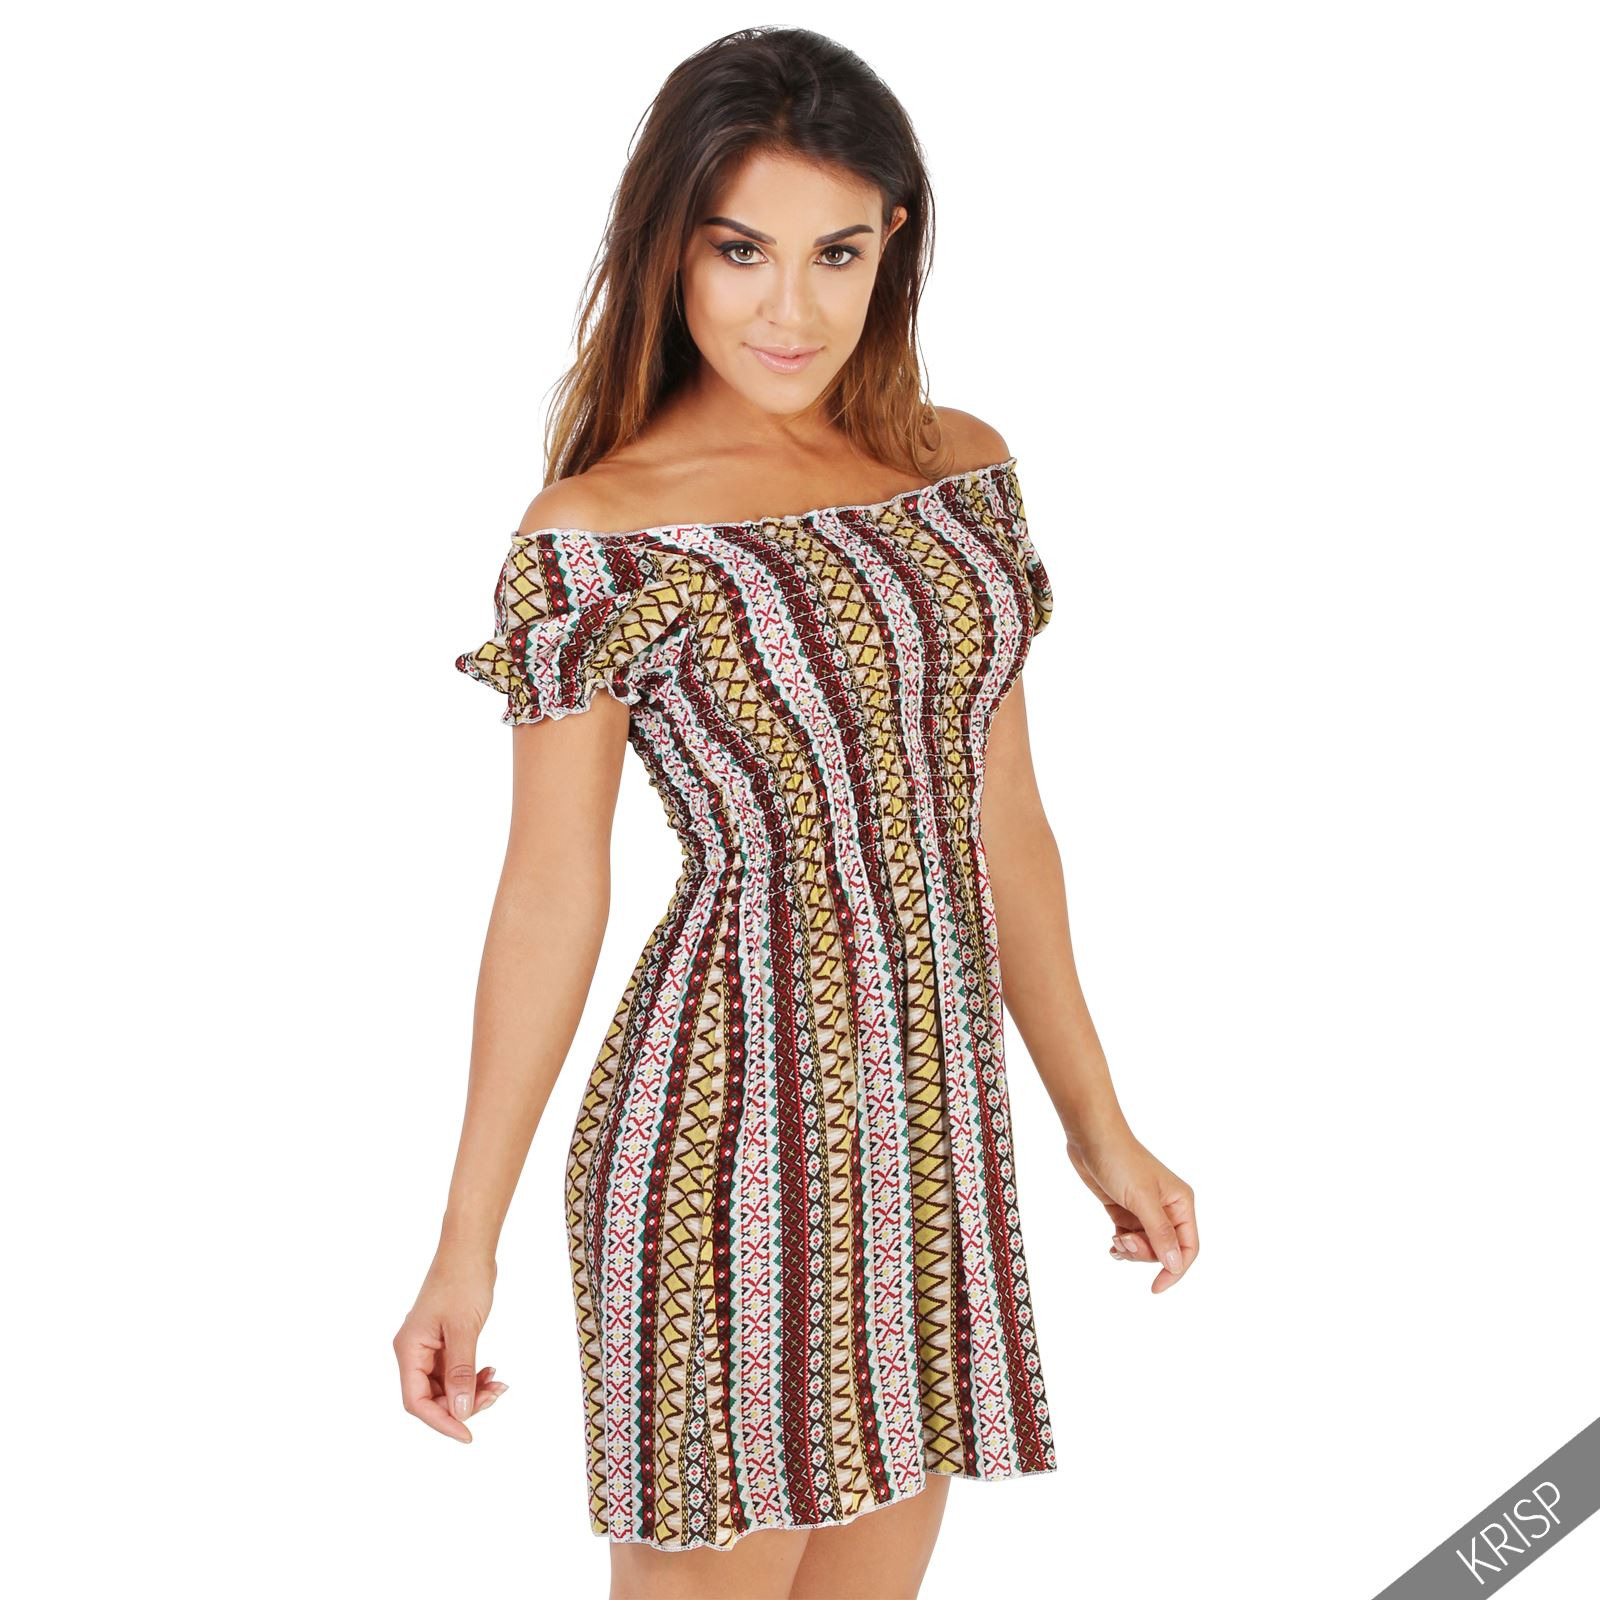 Damen Tunika Kleid Minikleid Longtop Trachten Folklore